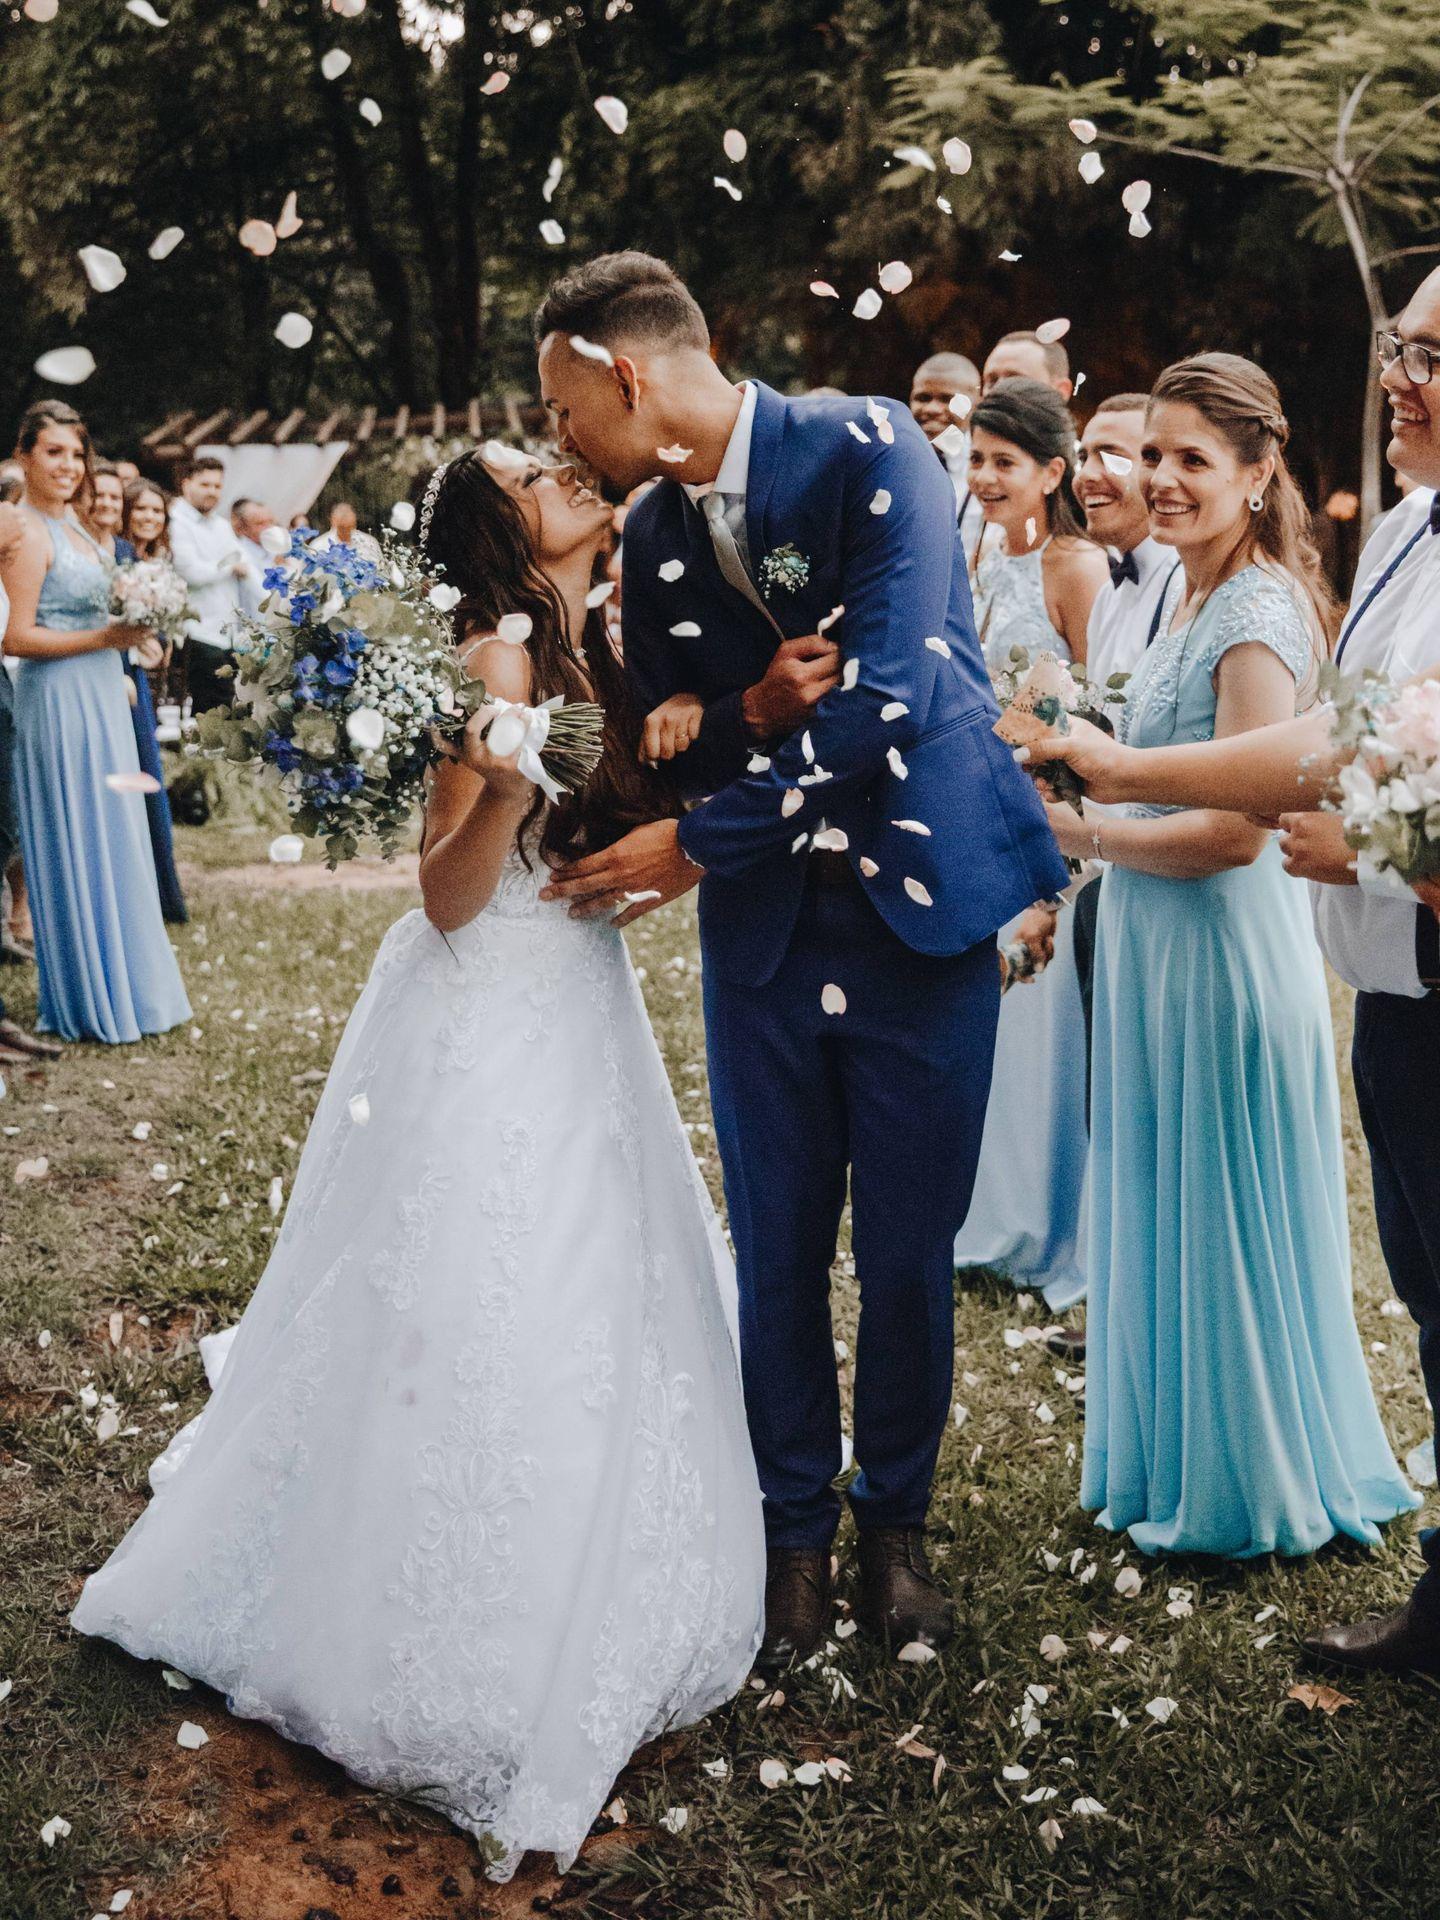 Distribución de las mesas en la boda. (Leonardo Miranda para Unsplash)